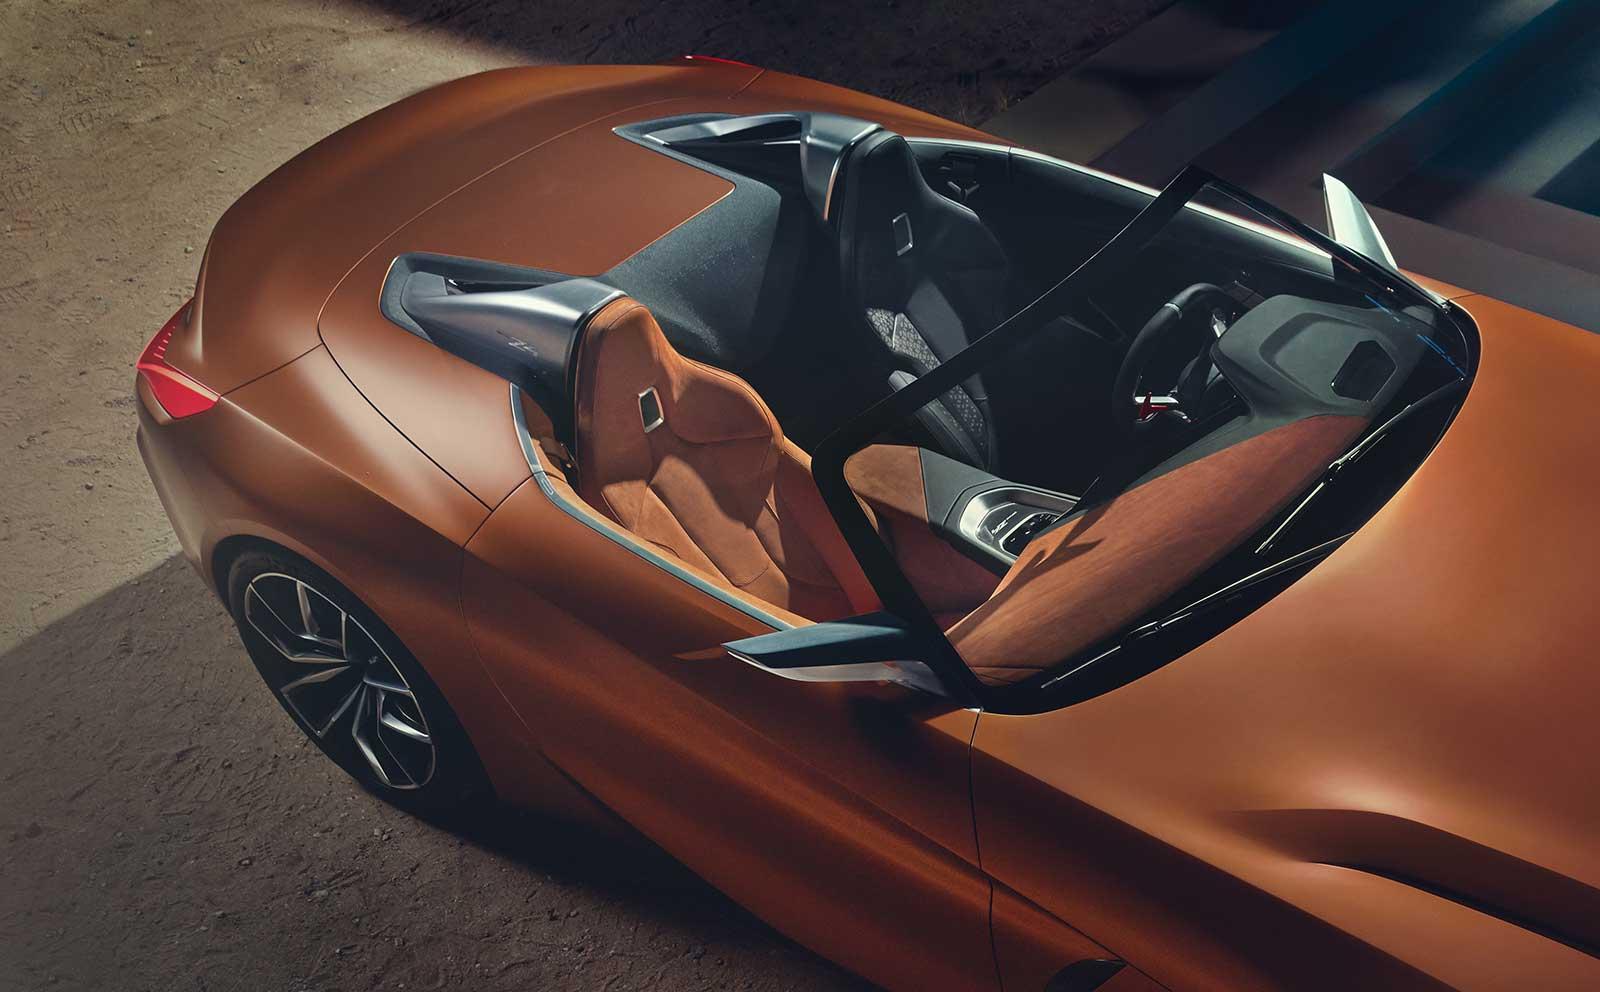 BMW-Z4-Concept-Peeble-Beach-2017-14.jpg